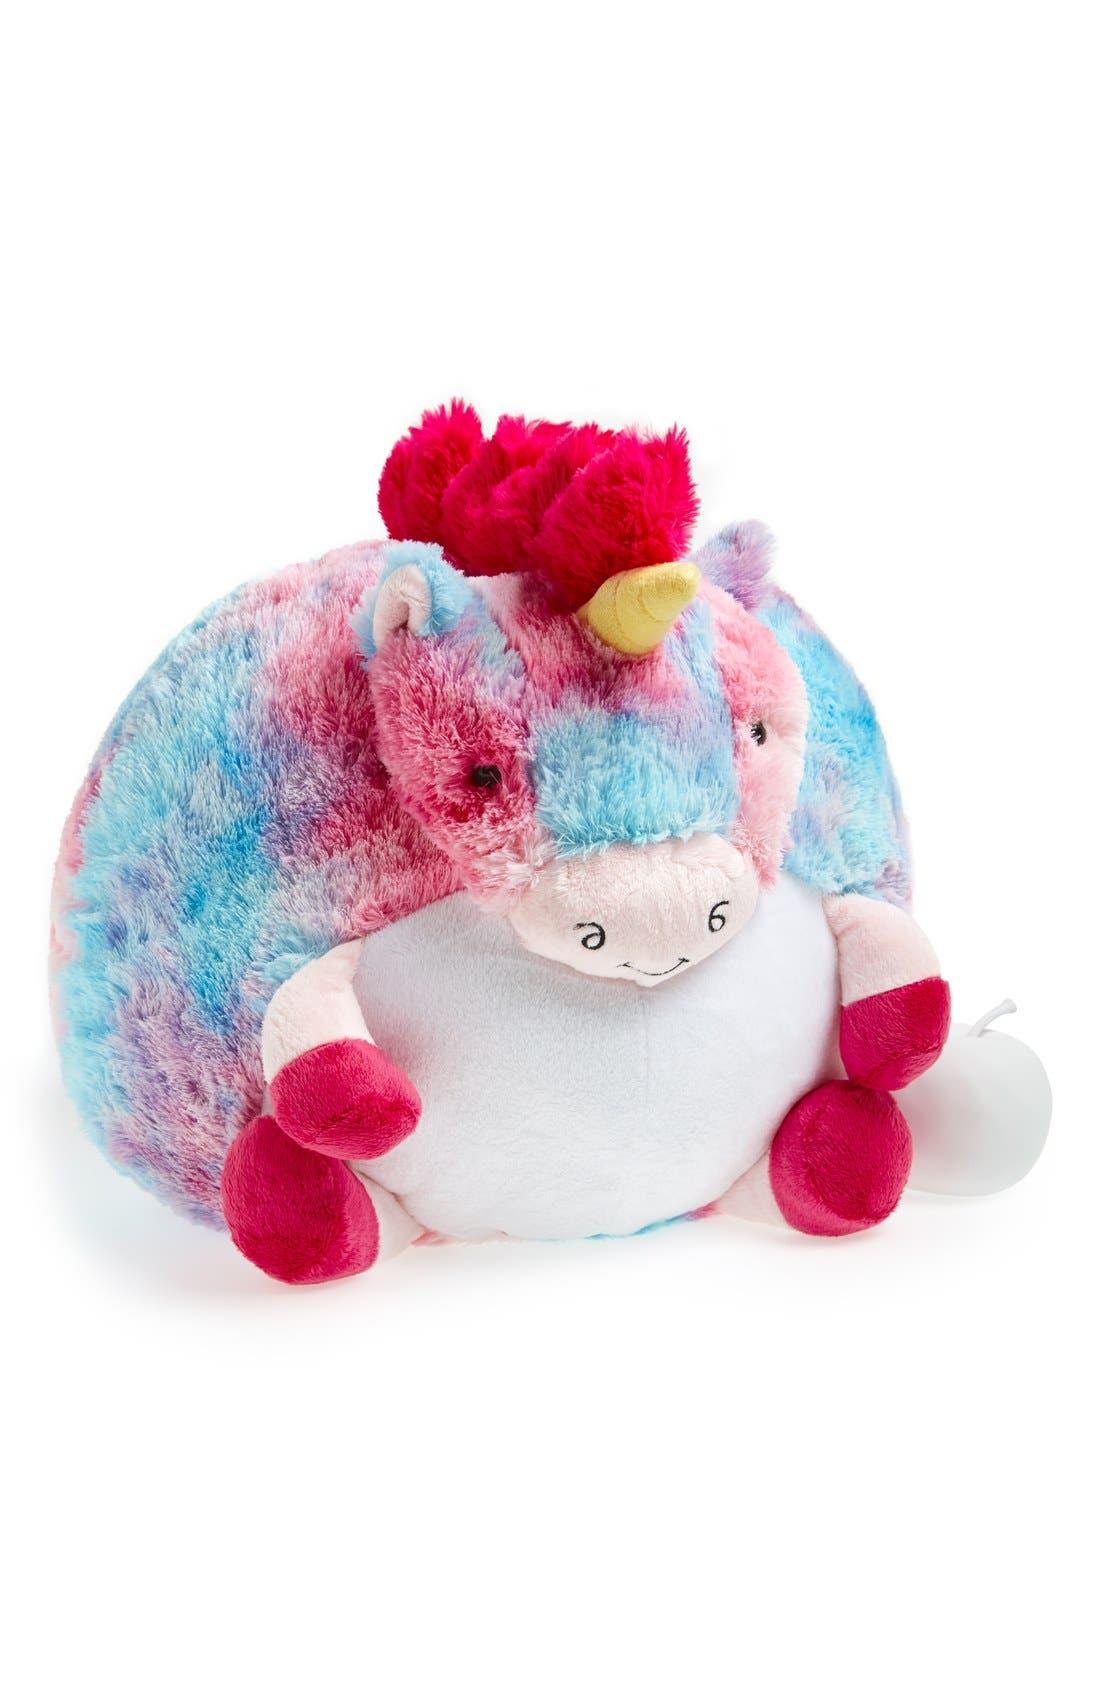 Main Image - Squishable 'Unicorn - Prism' Plush Stuffed Animal